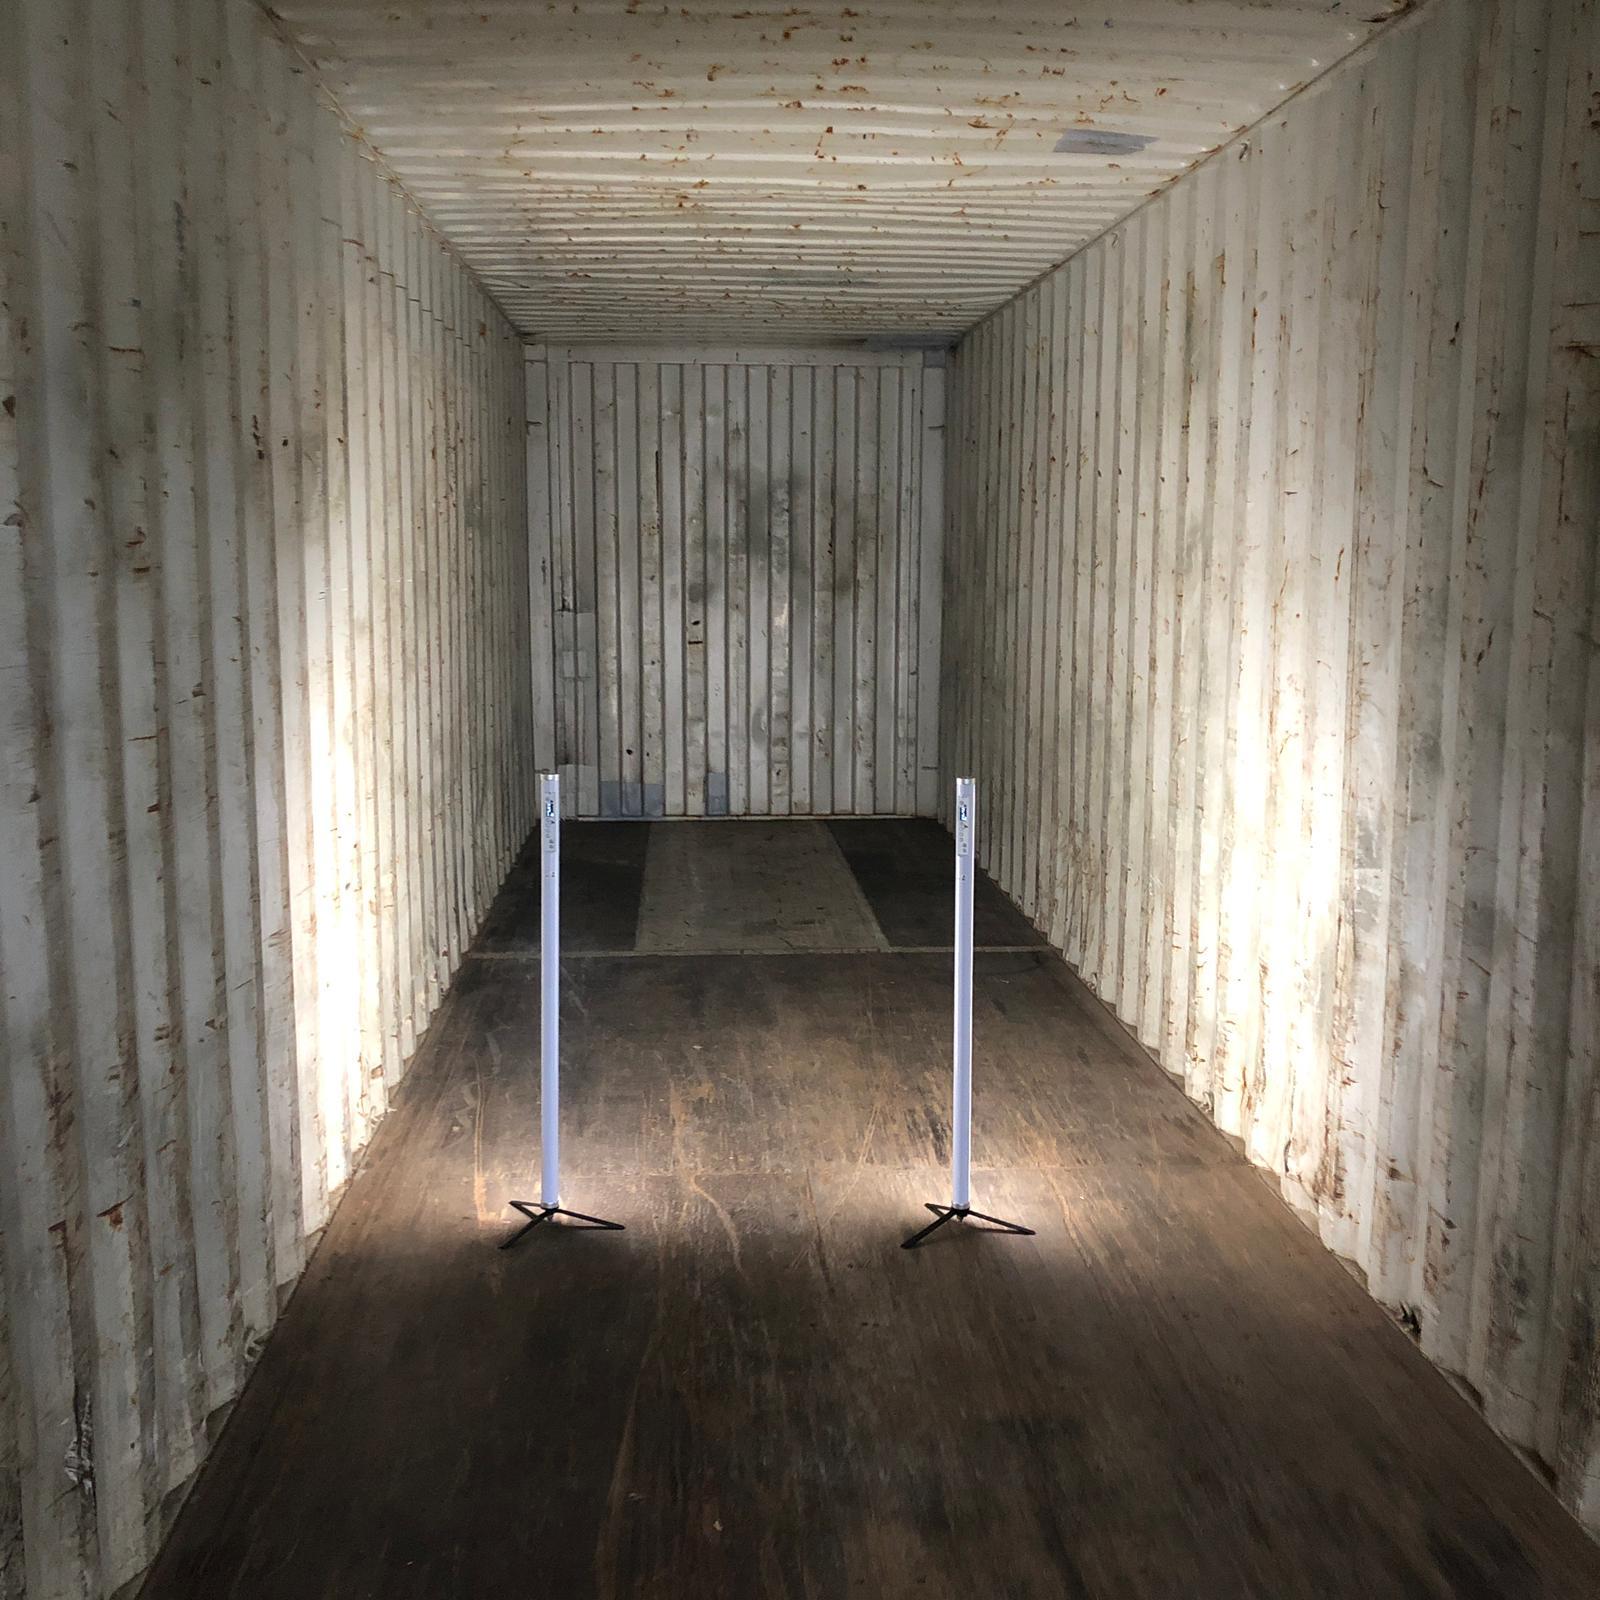 Container_Musikvideo_Weiß_Beleuchtung